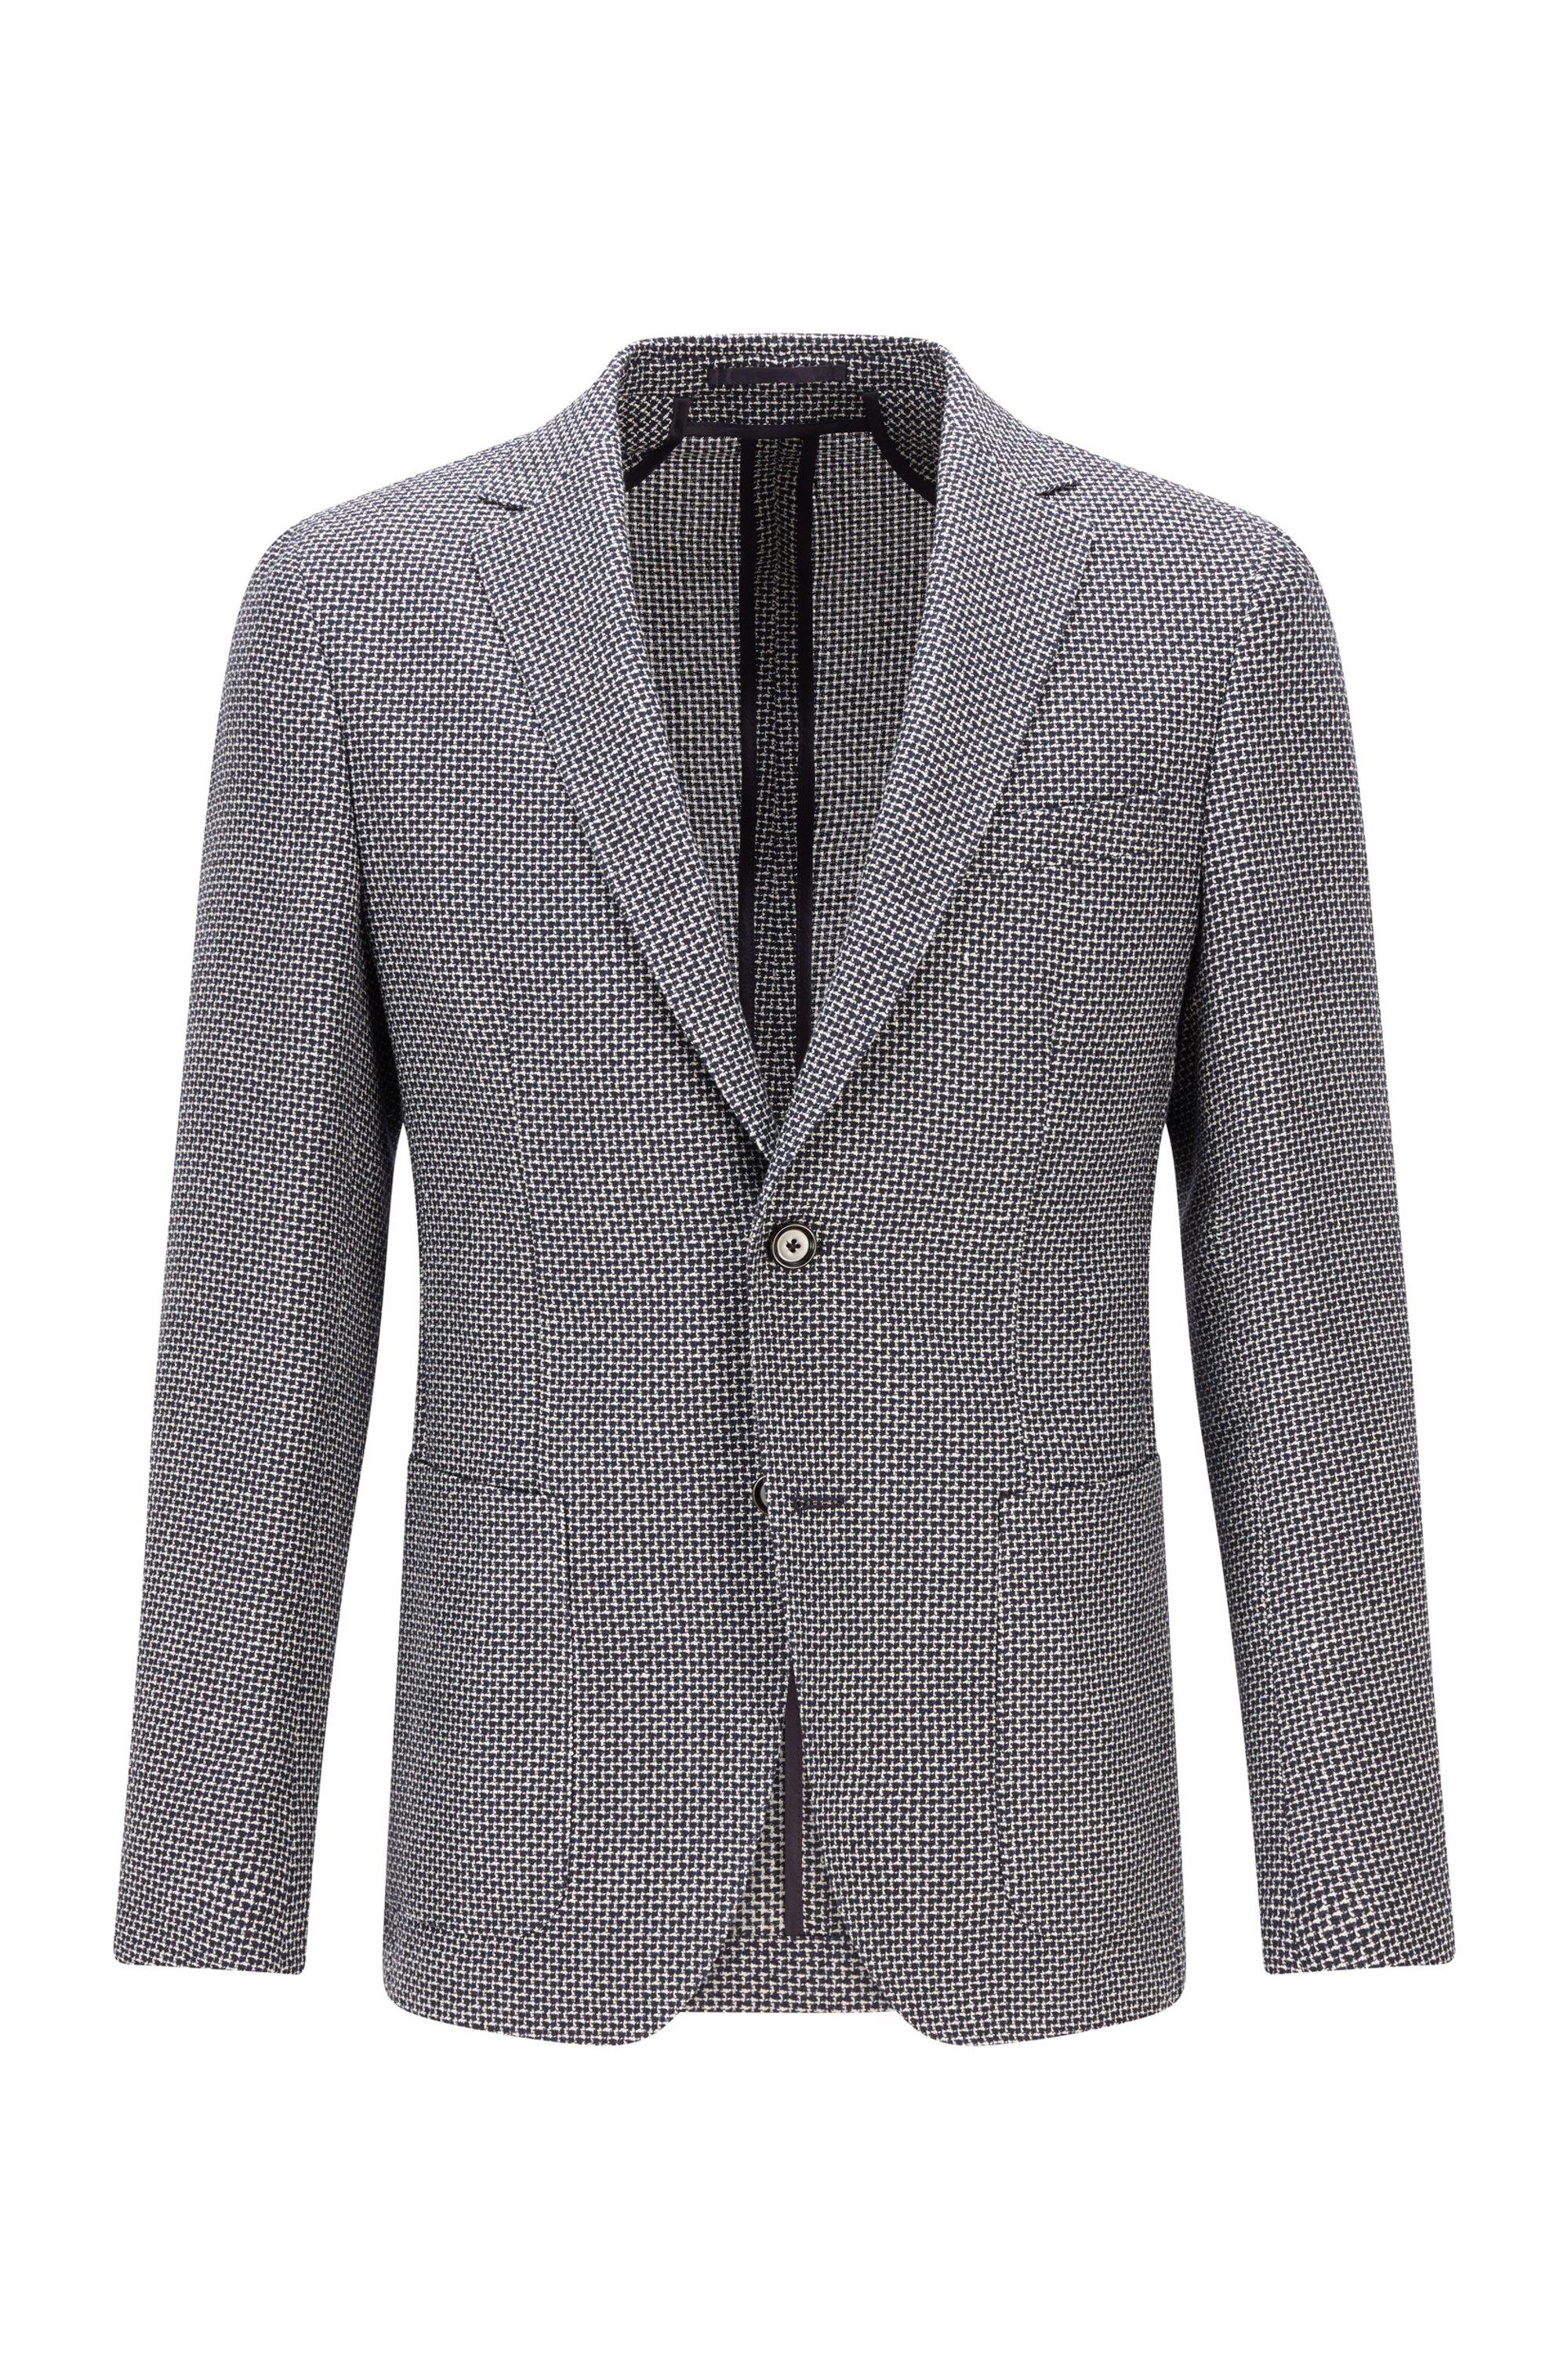 Patterned slim-fit jacket in virgin wool and linen, Dark Blue